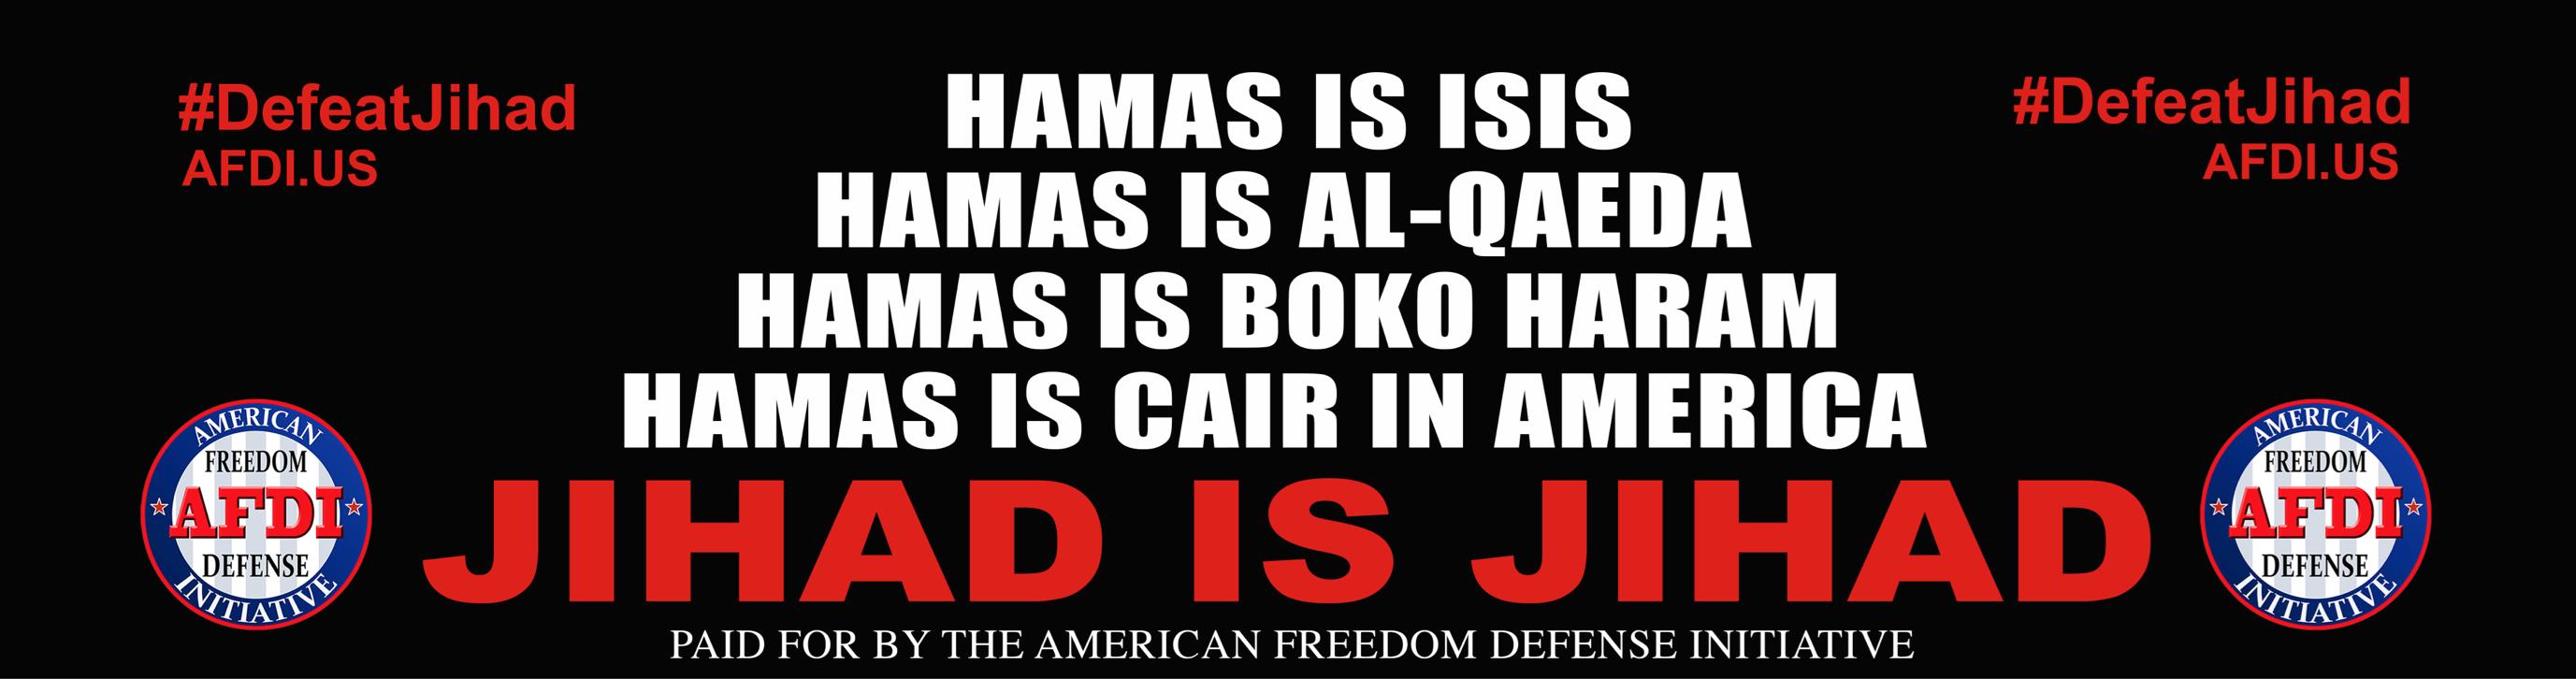 Geller MTA anti-Islam ad (2)